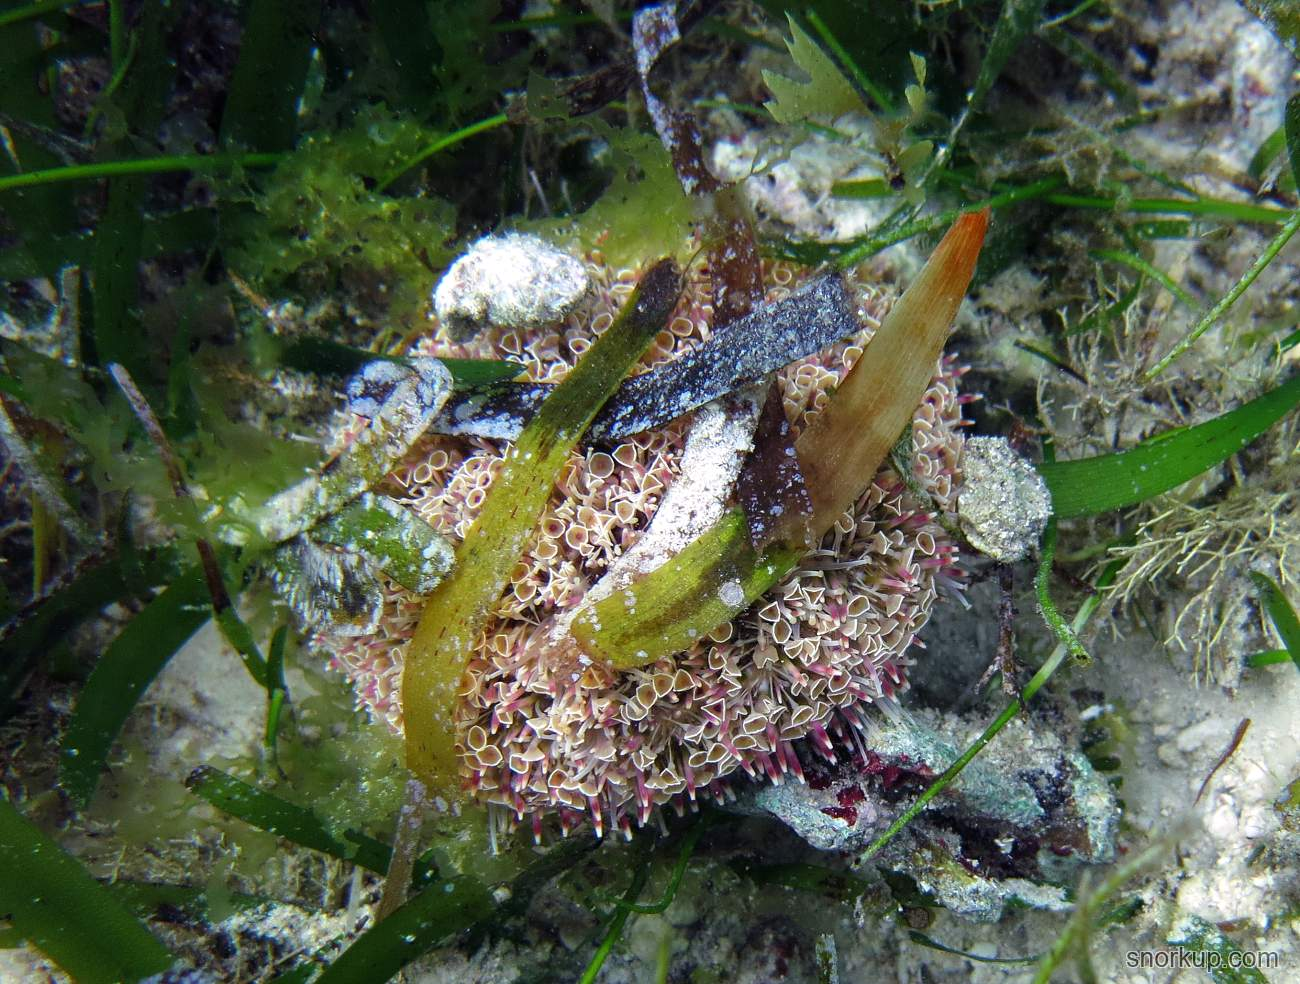 Морской еж токсопнеустес - Toxopneustes pileolus - Flower urchin. Чрезвычайно ядовит!